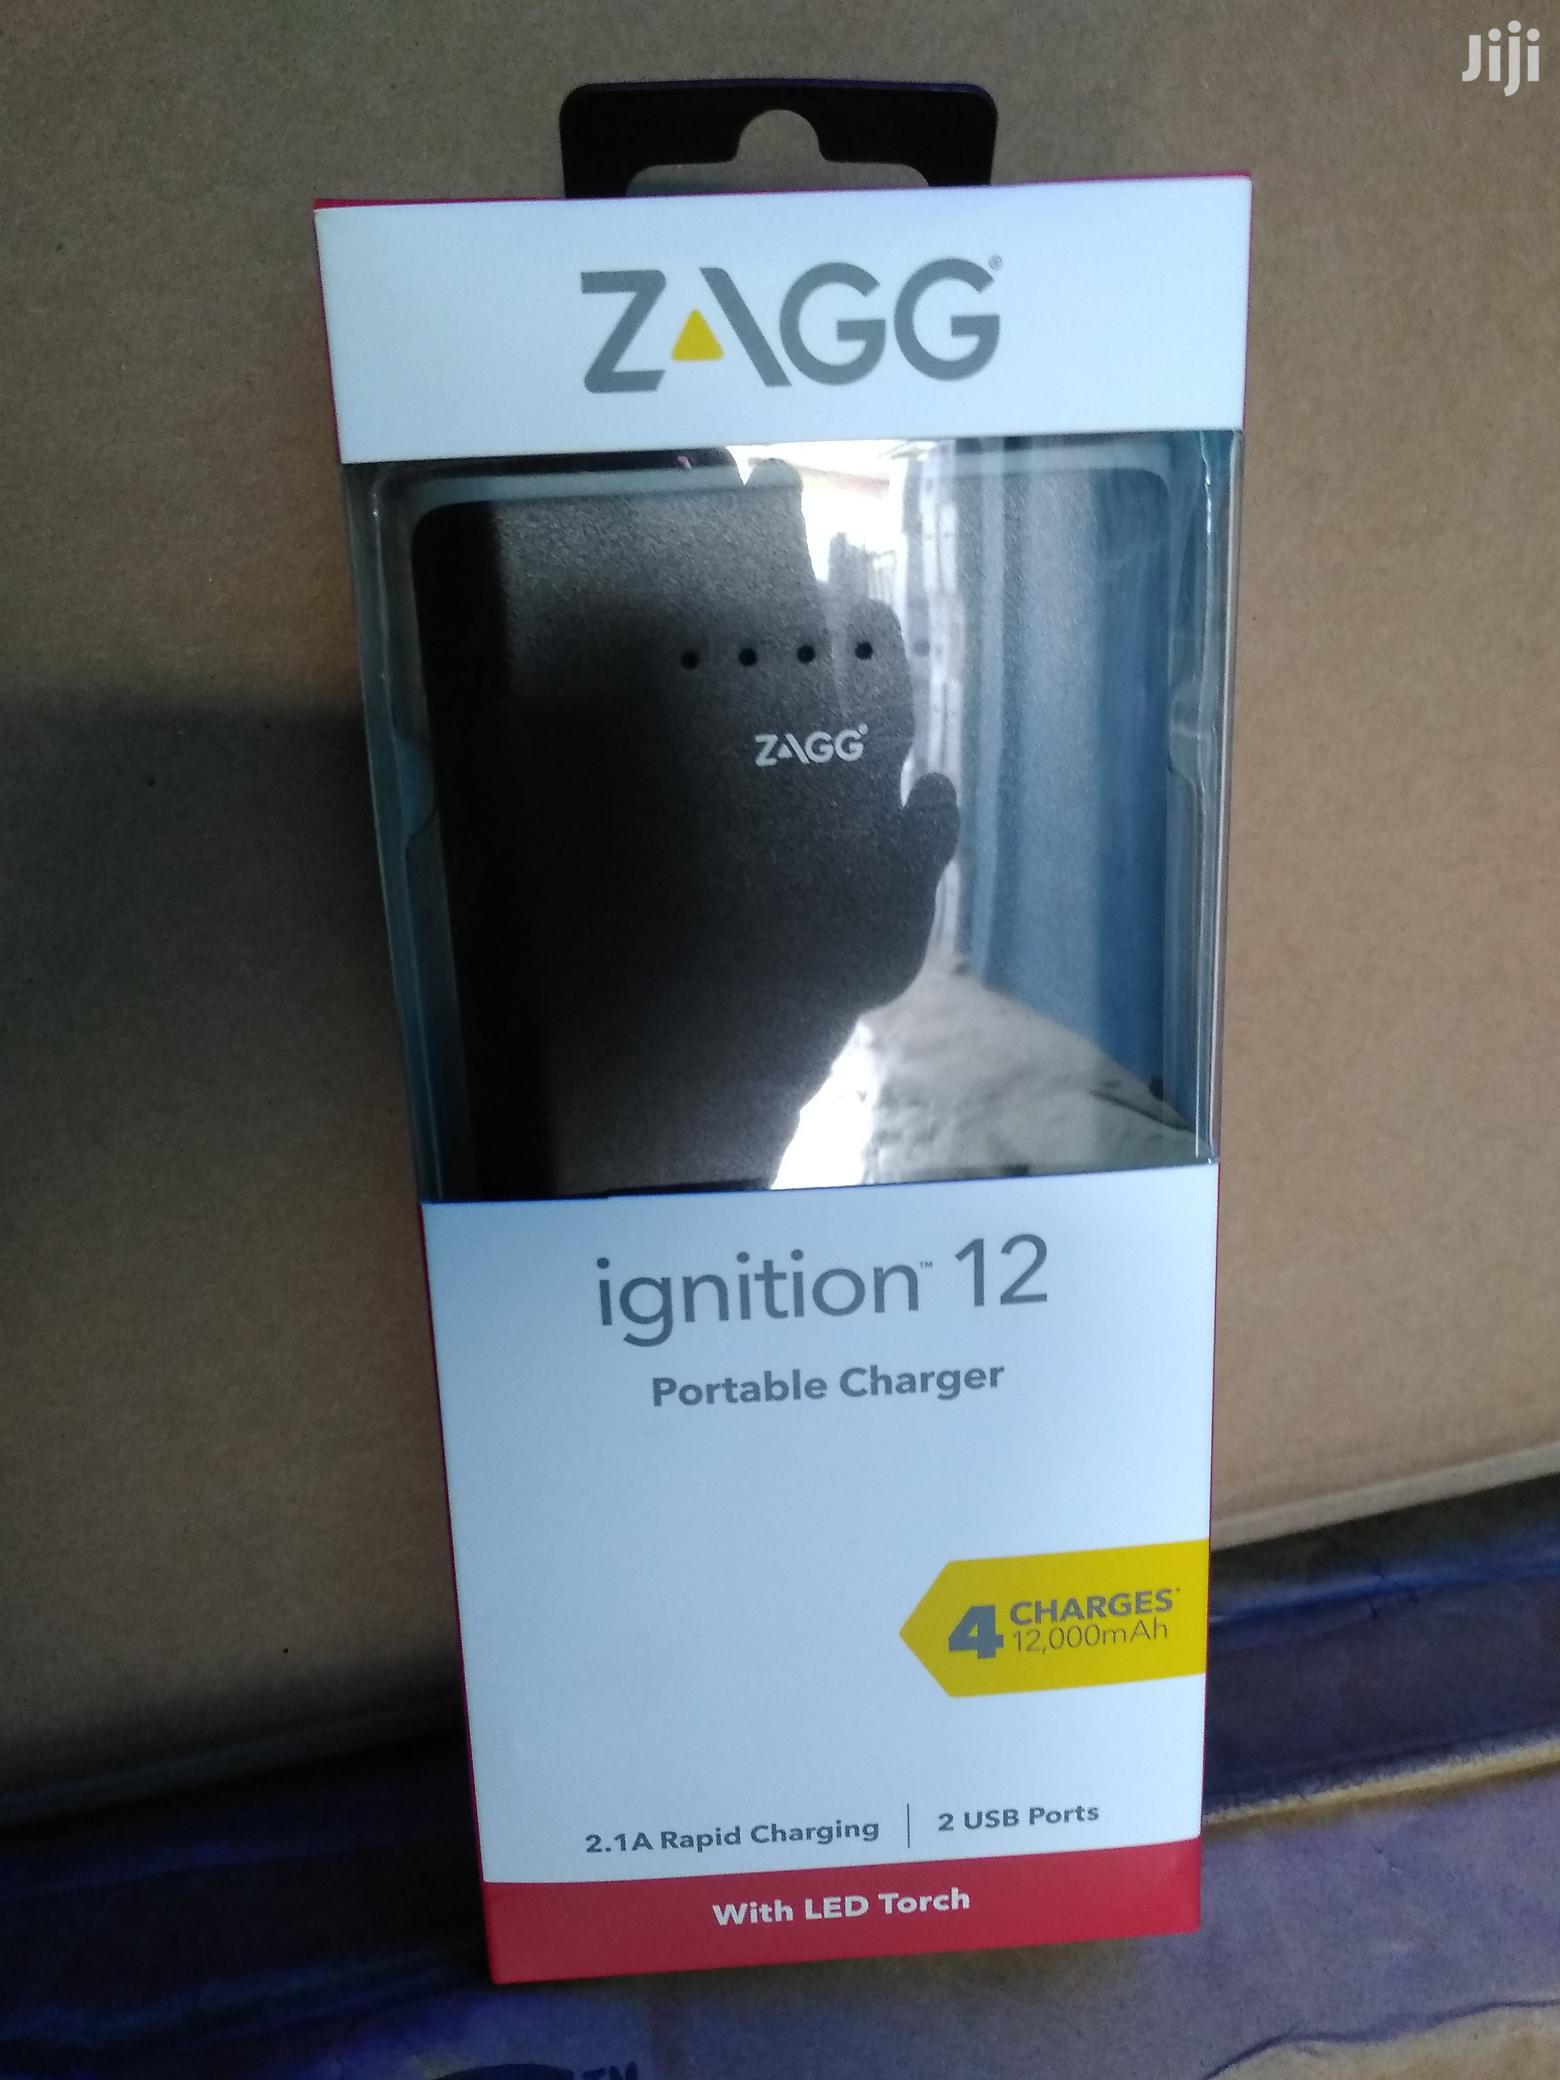 Zagg Power Bank Ignition12 (12000mah)